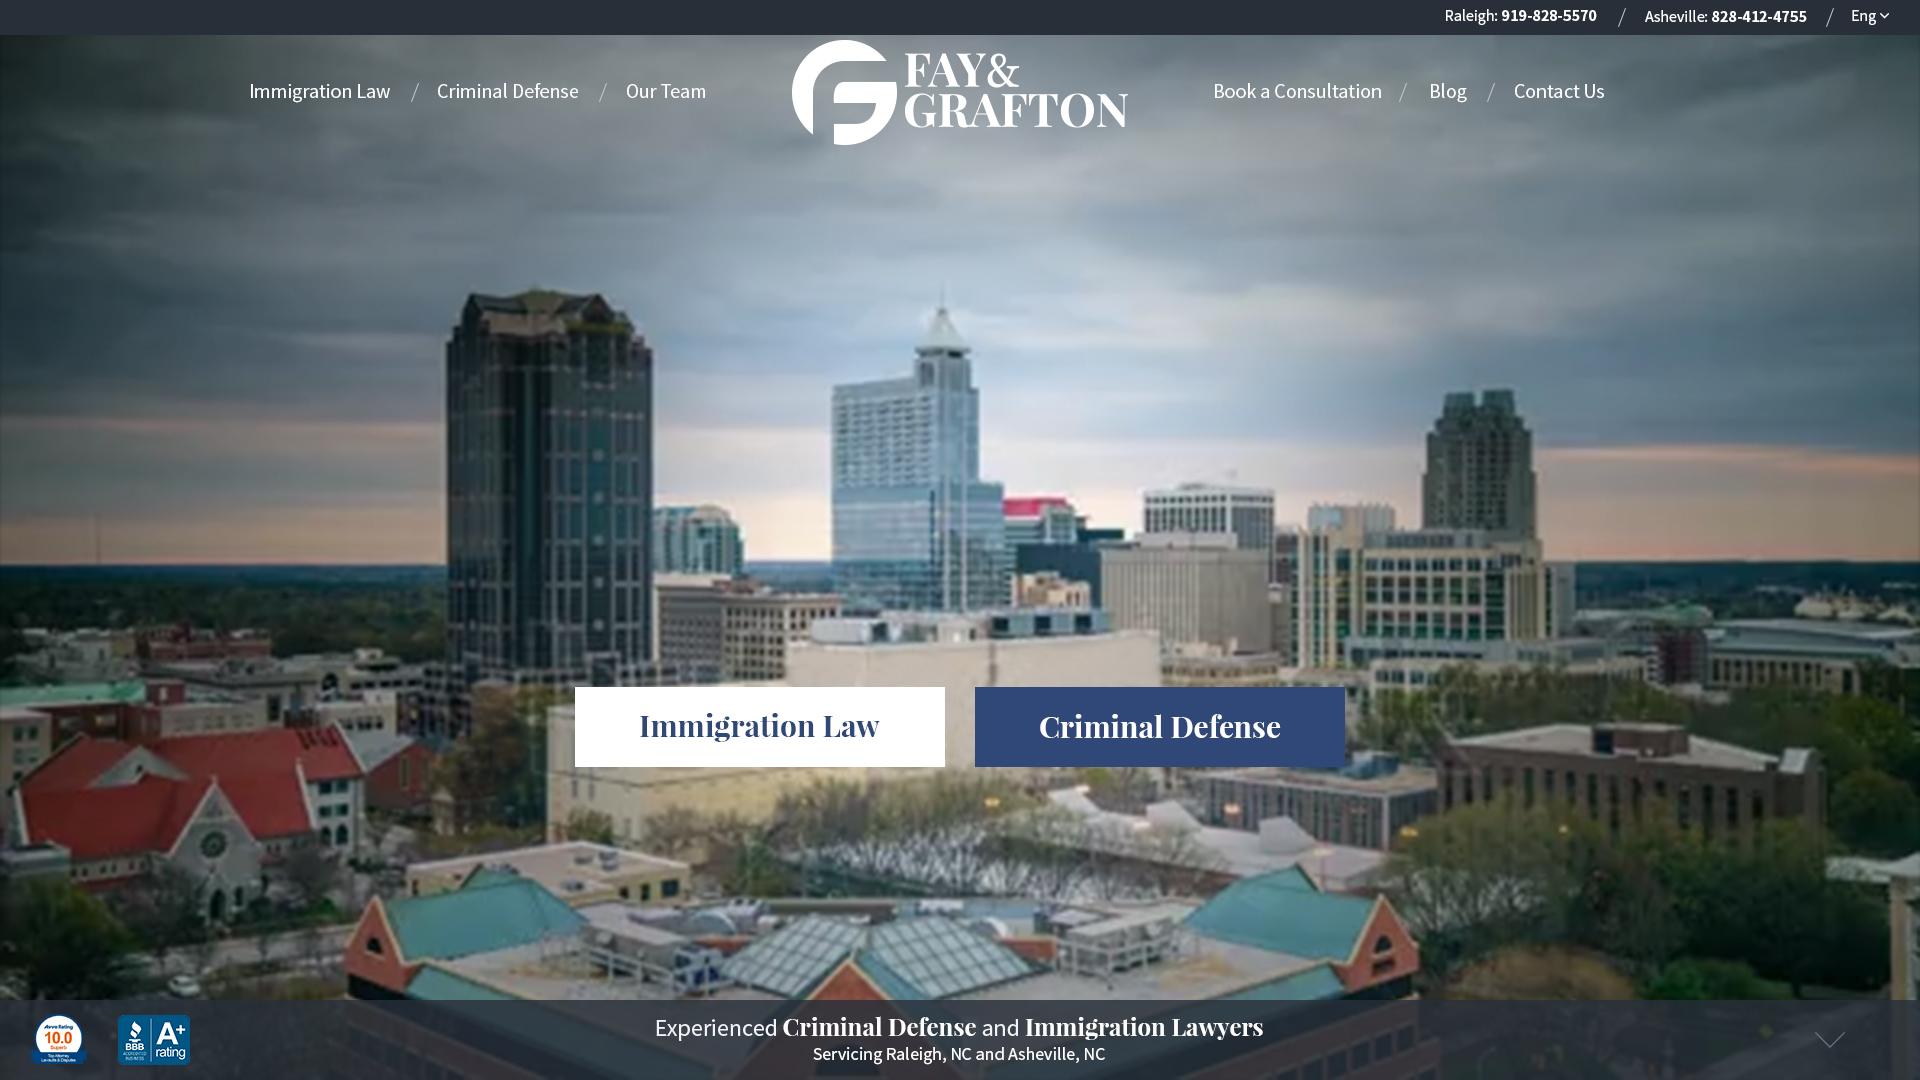 Fay & Grafton Website Design Preview